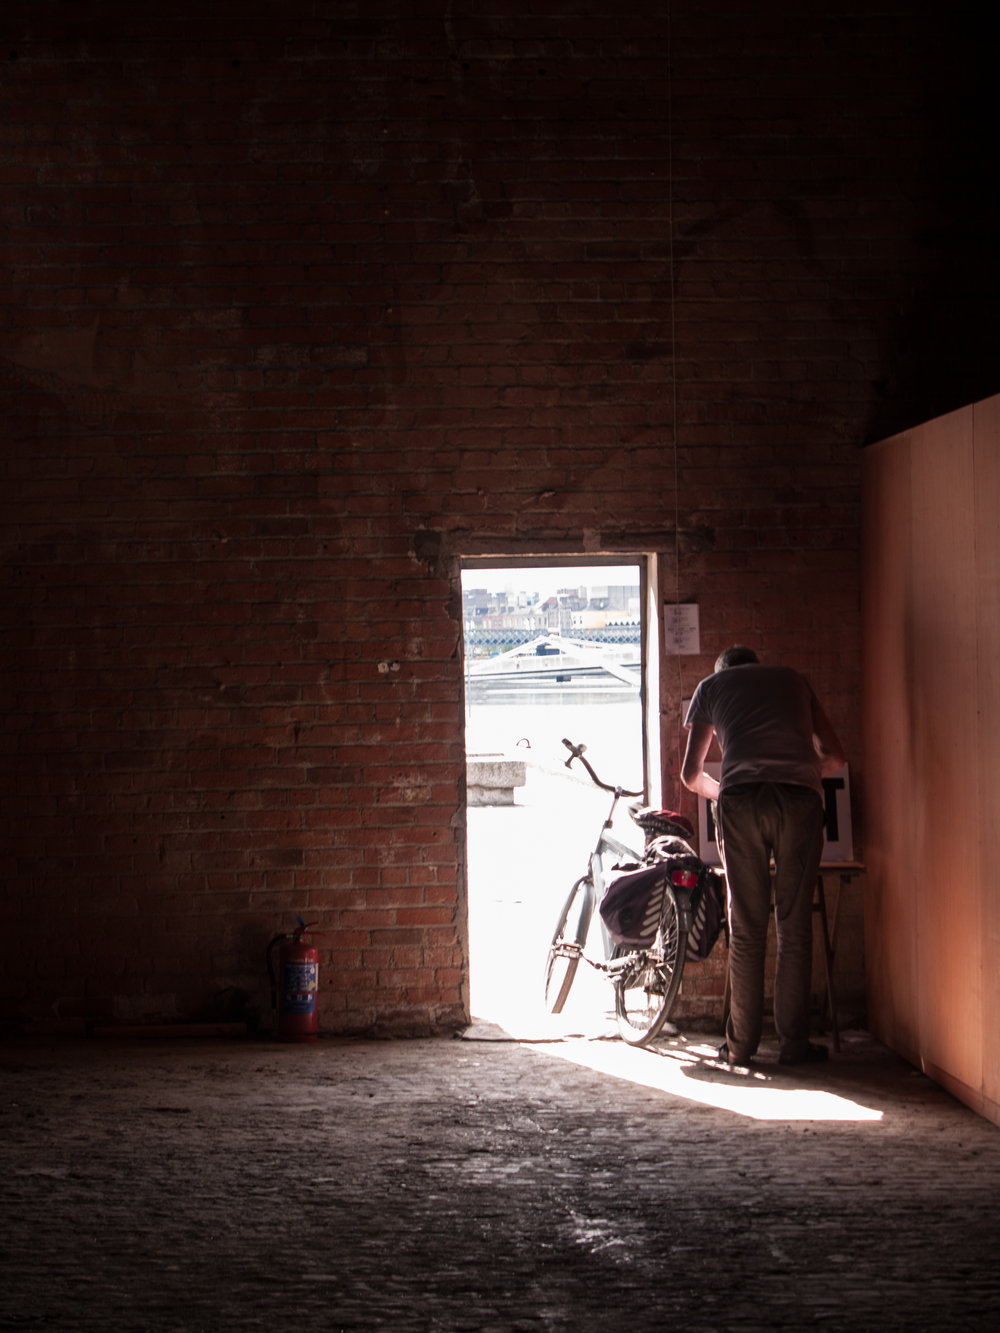 Dublin. Dublin city. street photography. ireland. travel. travel photography. photowalk. walking. people. street. art. on the street. packing the bike.jpg